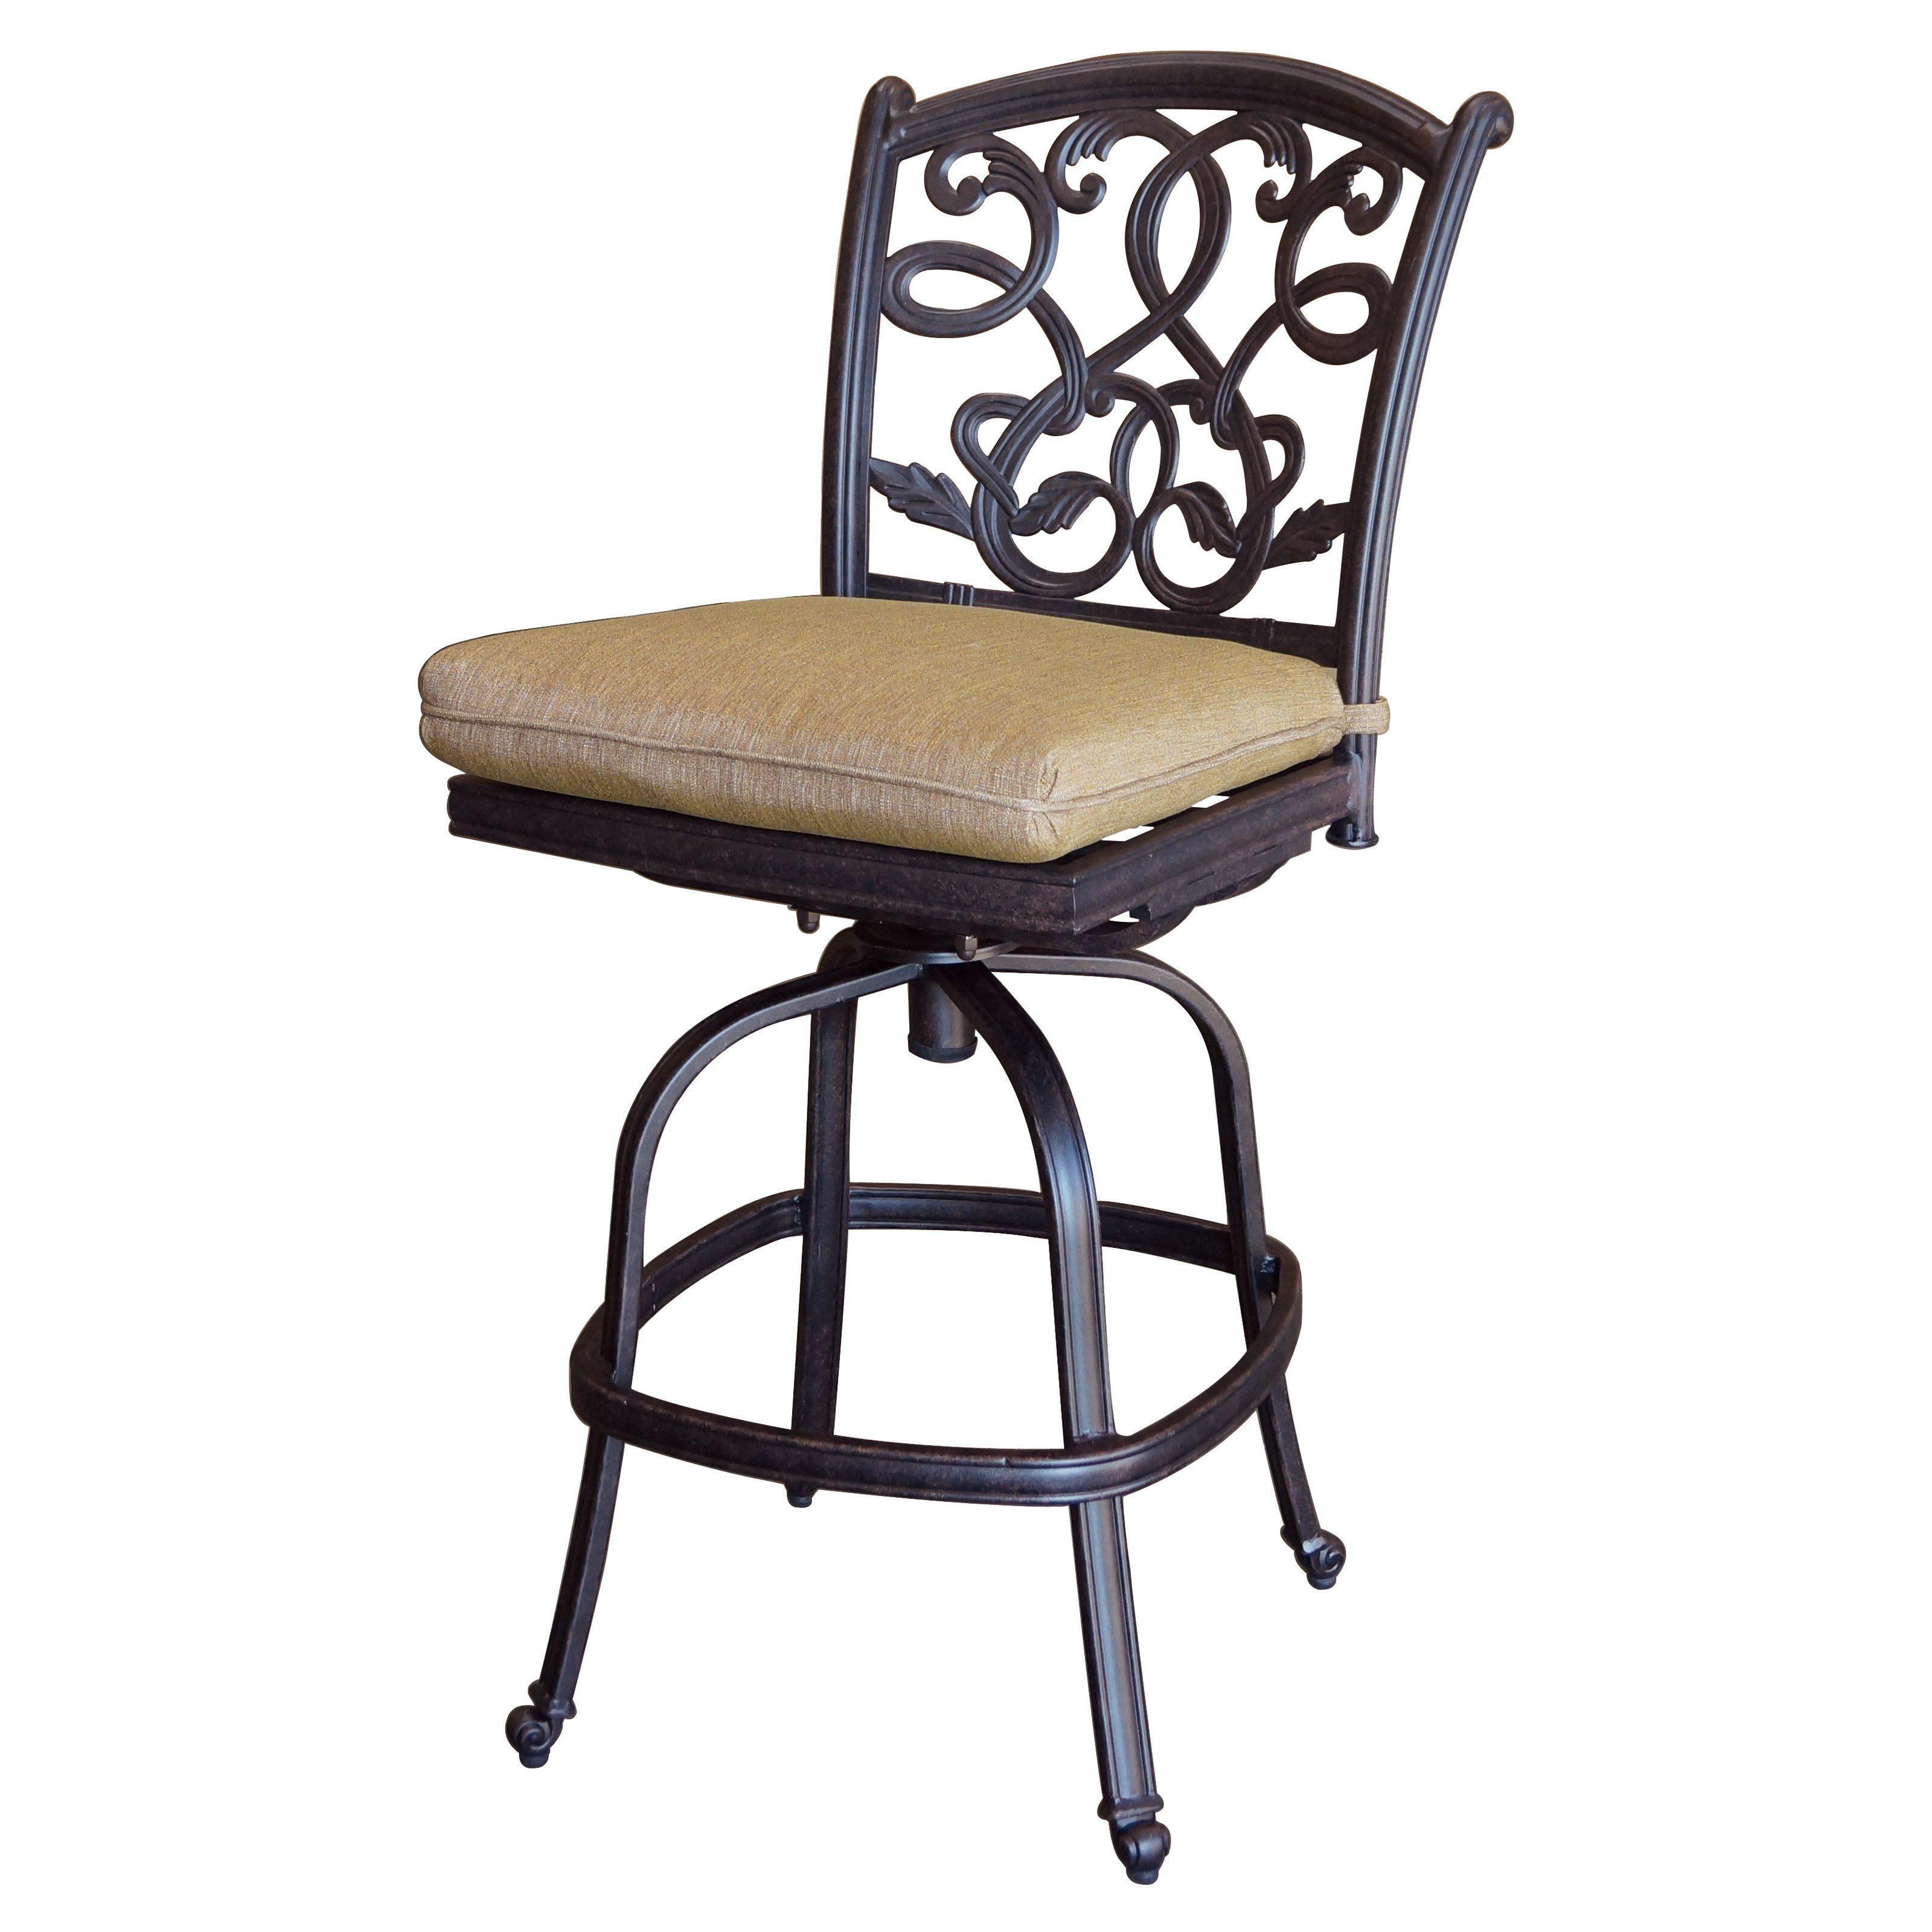 Marvelous Have To Have It Darlee Santa Monica Armless Swivel Bar Spiritservingveterans Wood Chair Design Ideas Spiritservingveteransorg